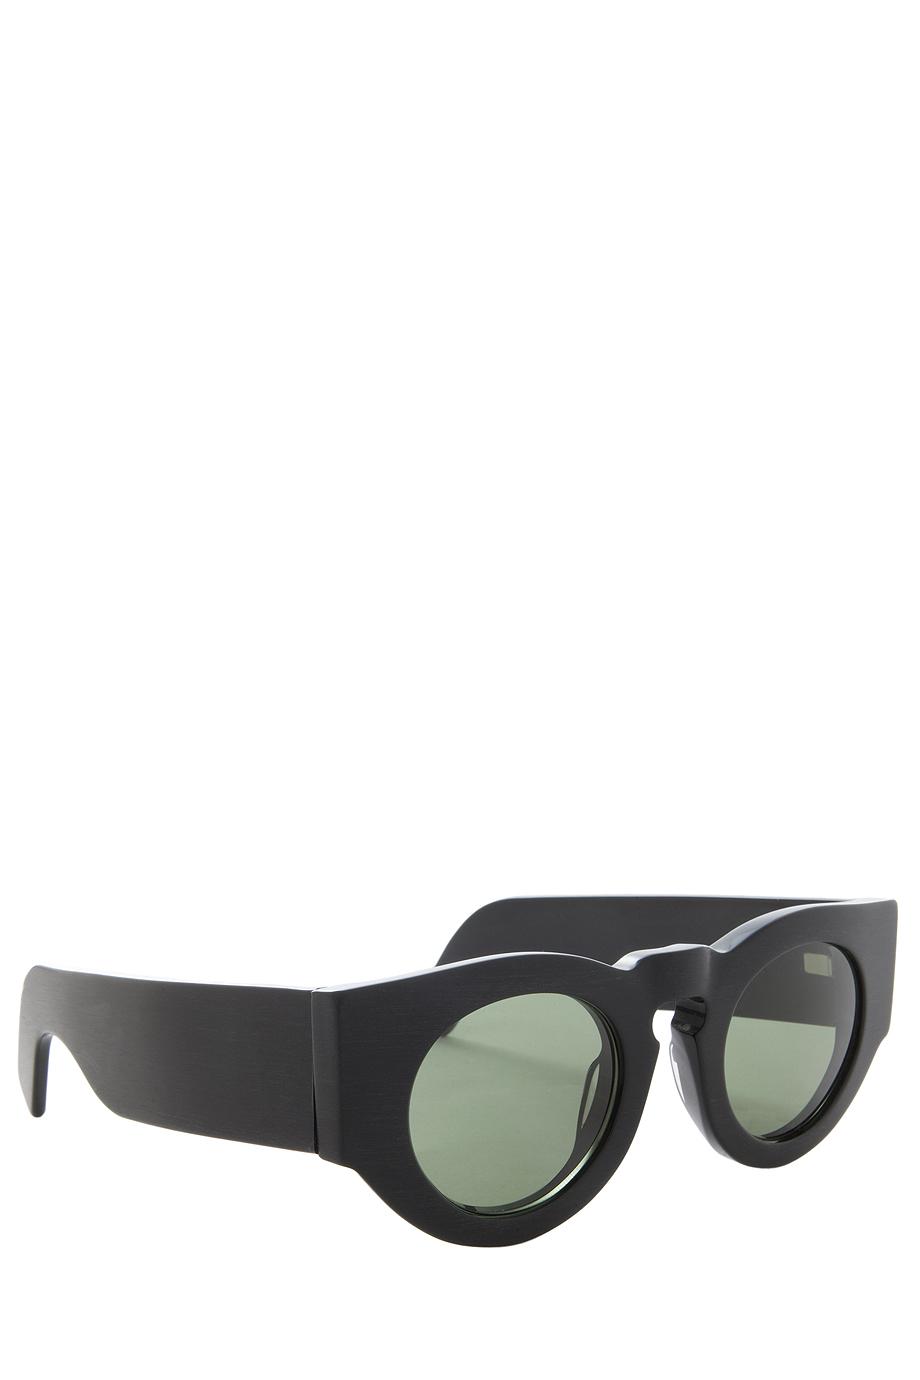 Black Hole Sunglasses Acne Studios ooTuvk